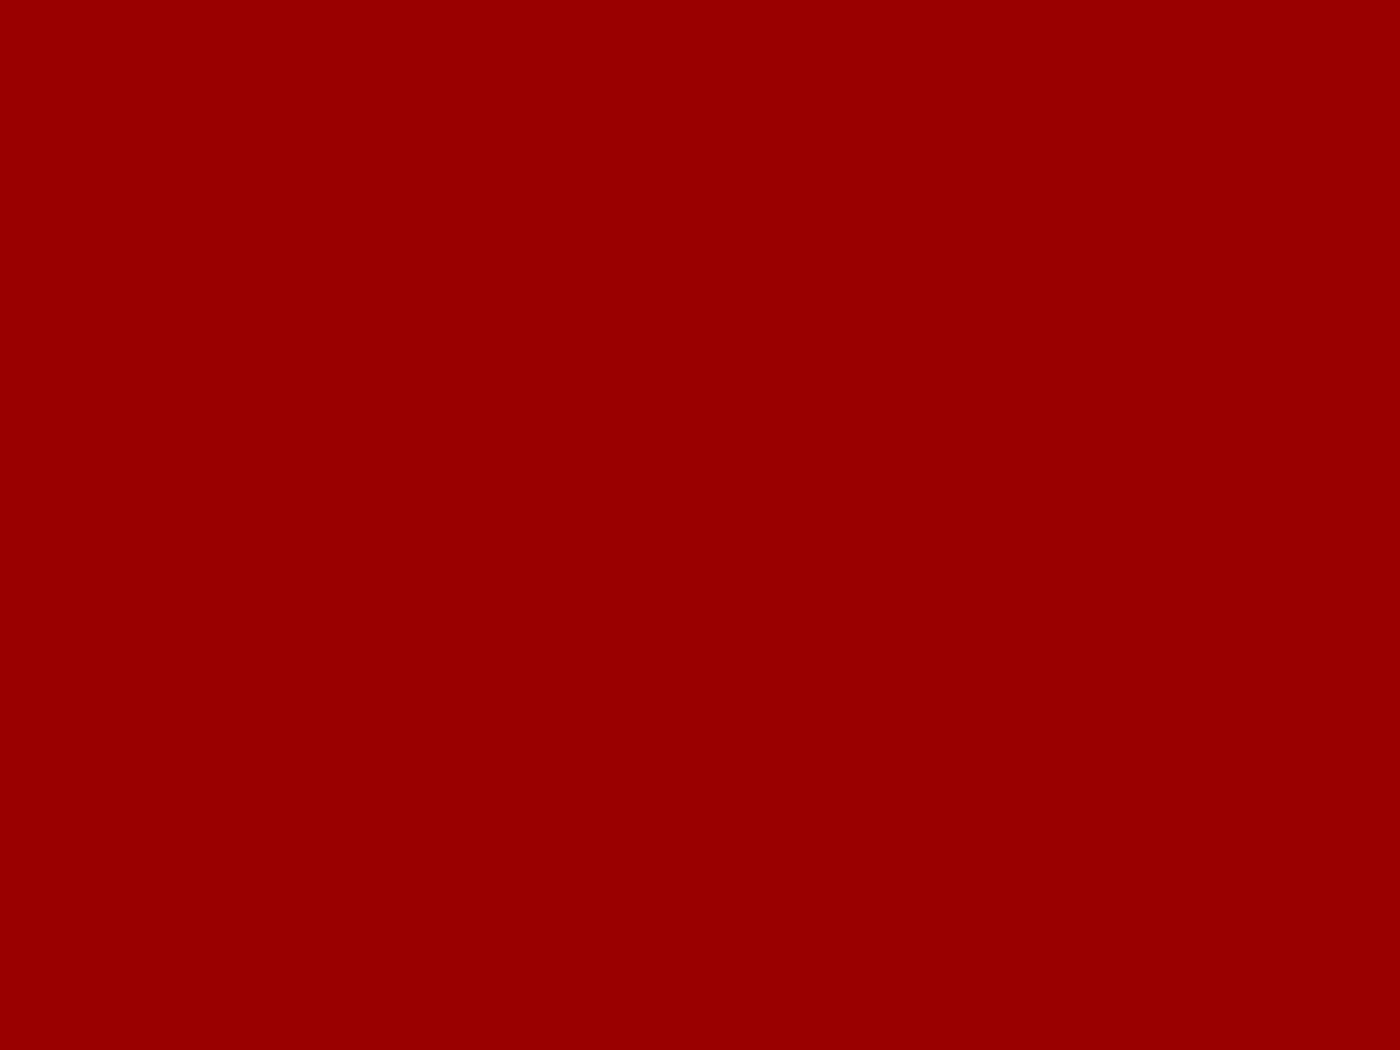 1400x1050 Stizza Solid Color Background